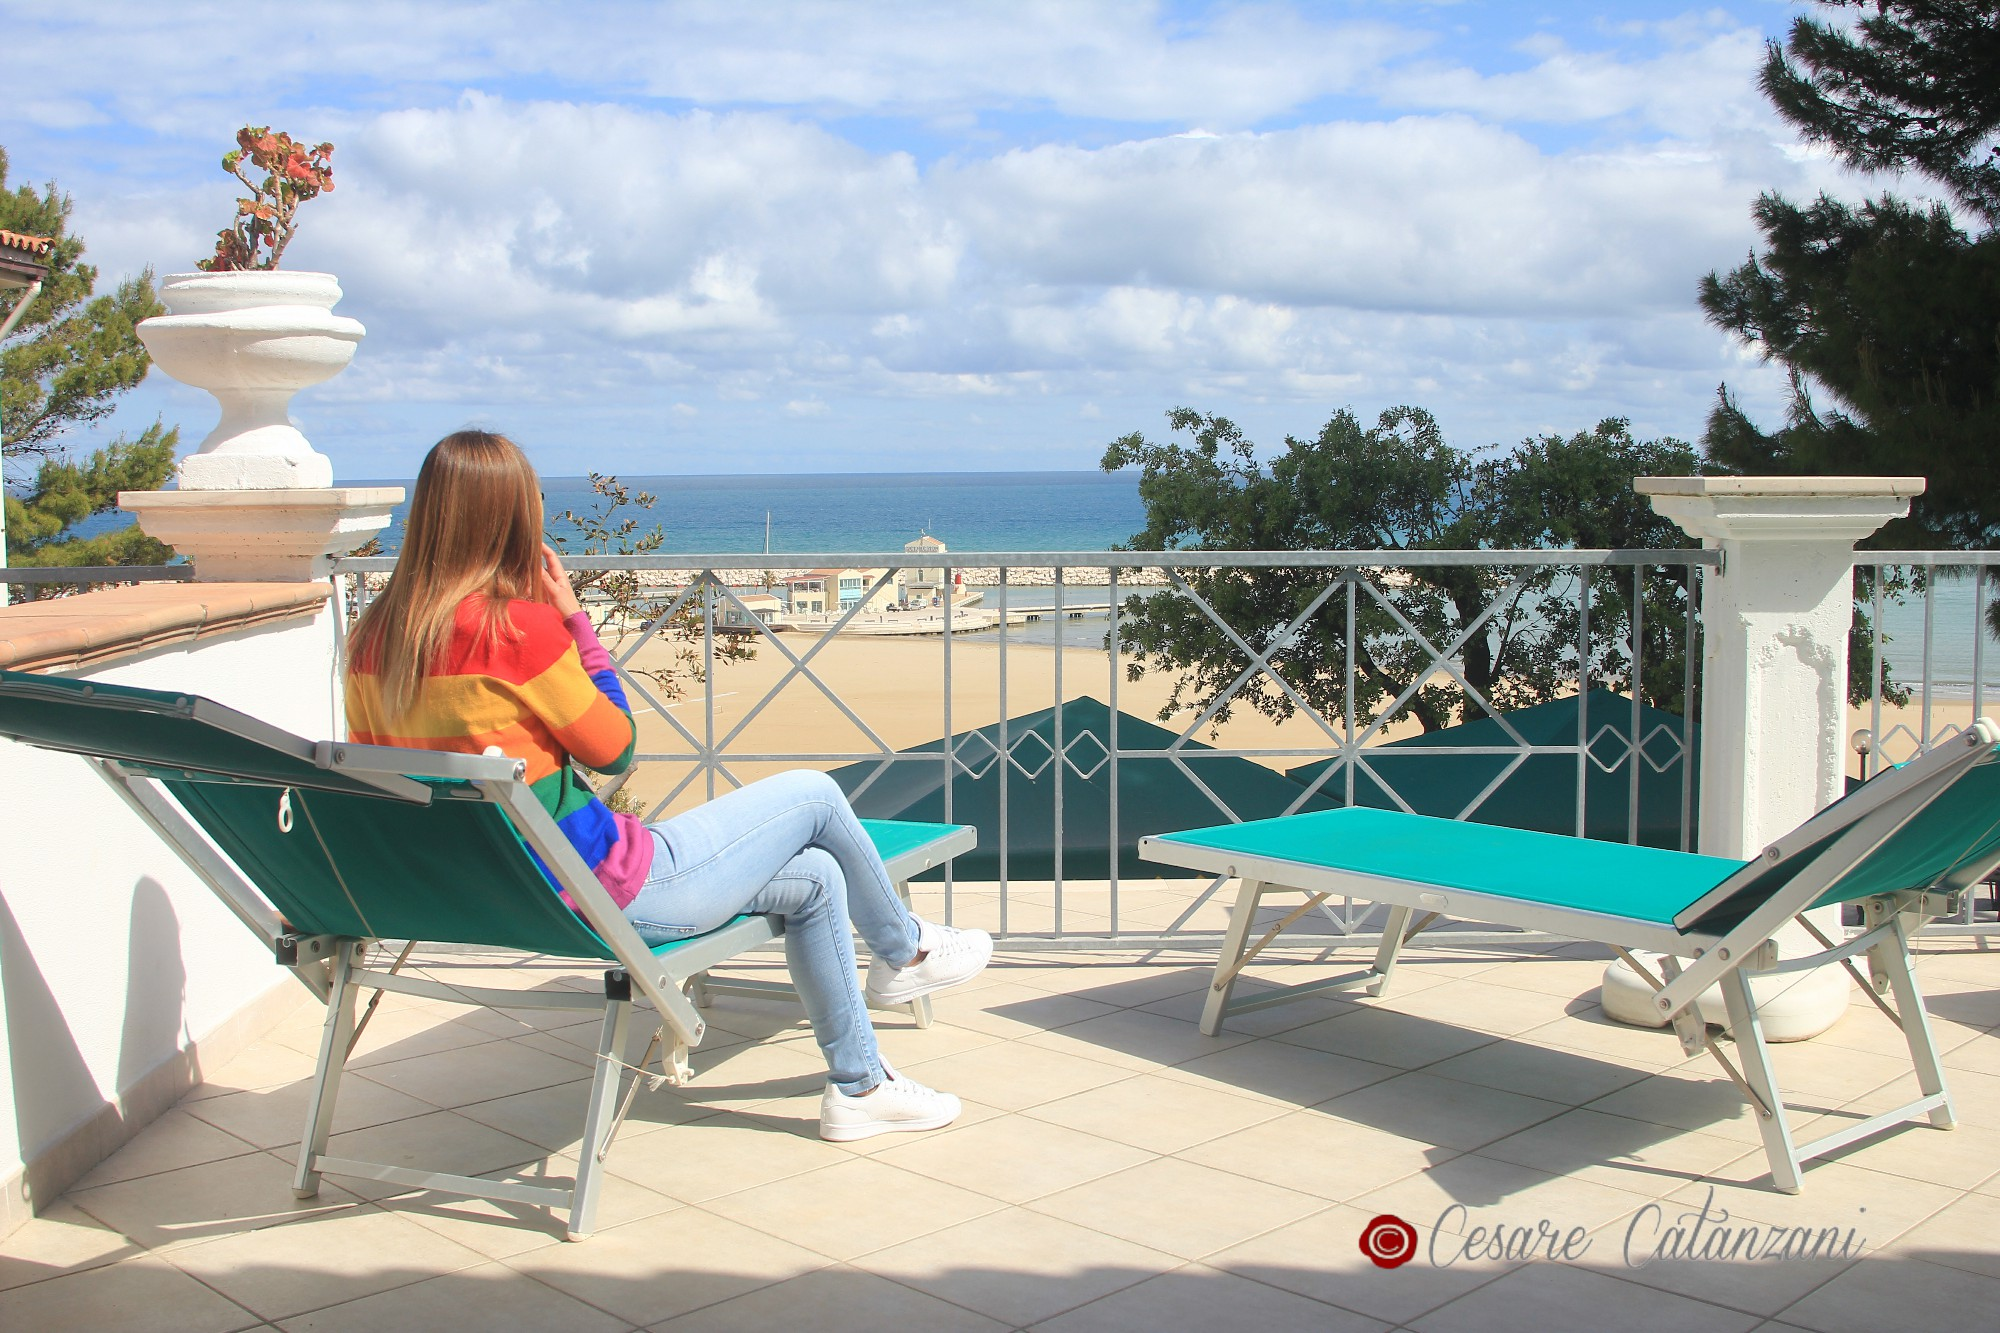 Hotel Piccolo Paradiso slide 3